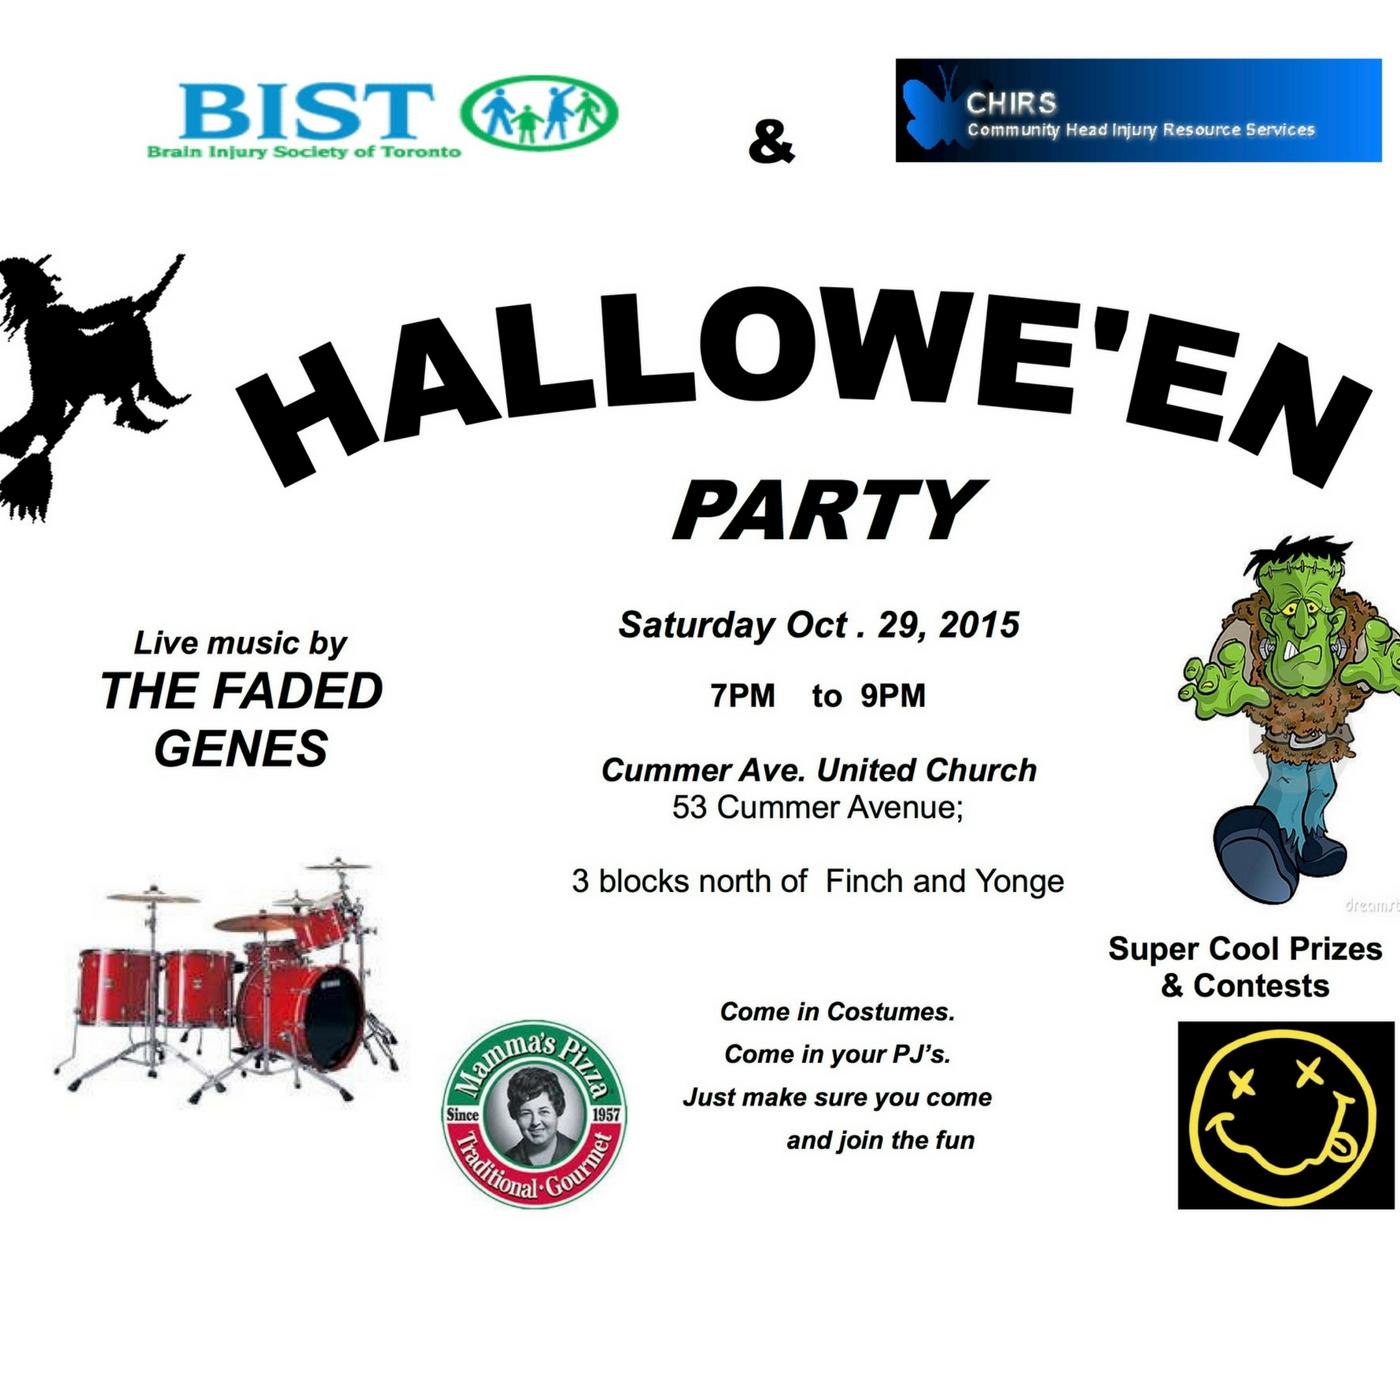 Halloween Party BIST